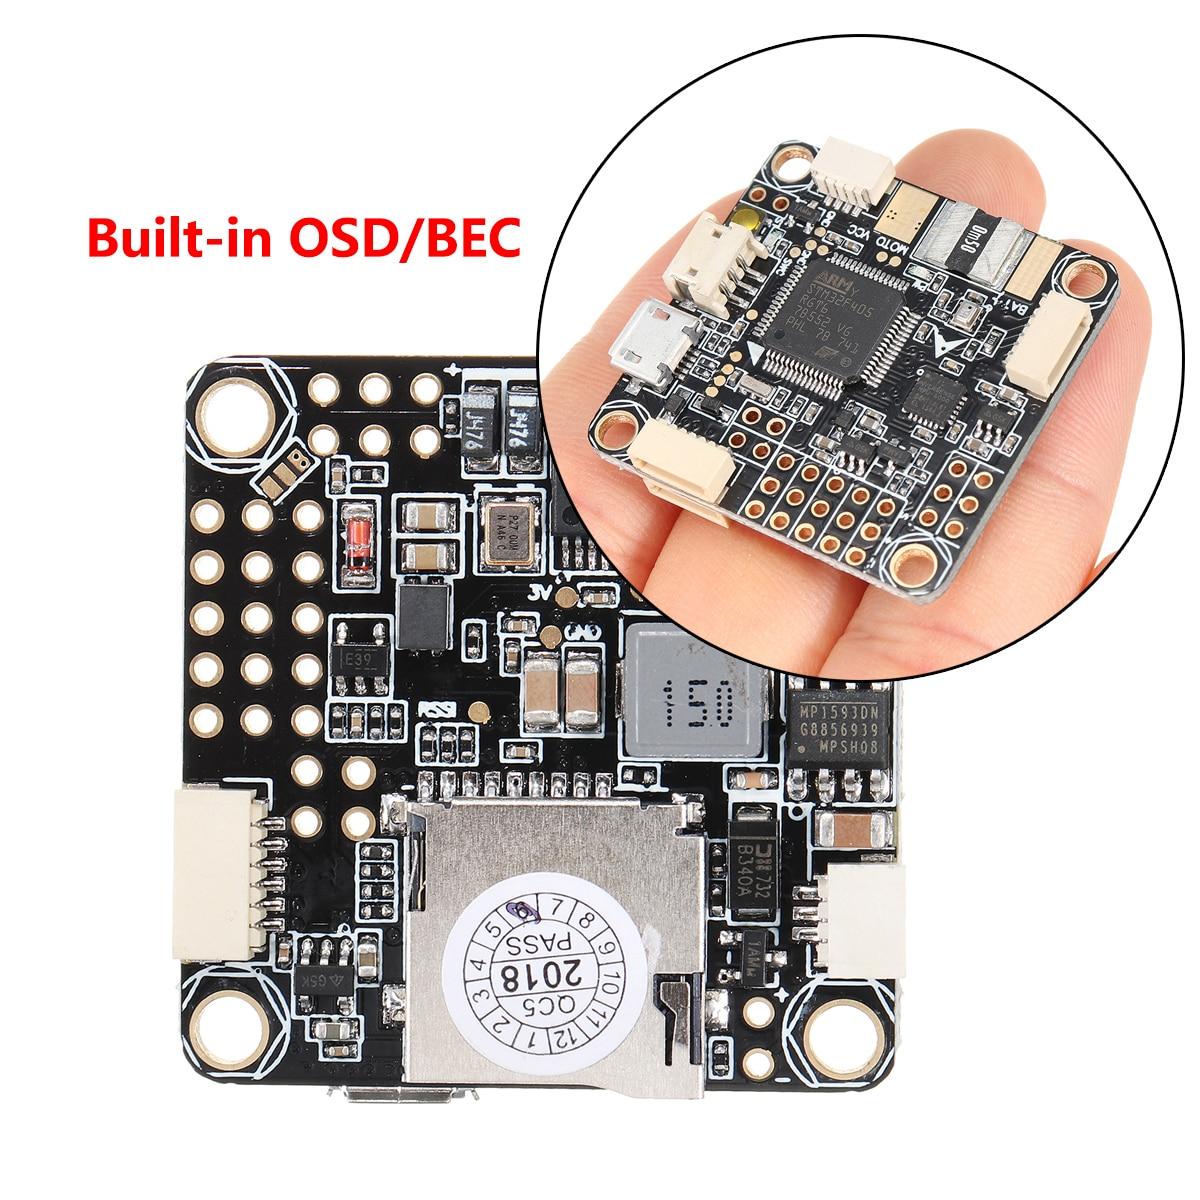 Para Betaflight F4 PRO V2 controlador de vuelo incorporado OSD/BEC Drone bajo ruido estable para FPV Racing actualizado último